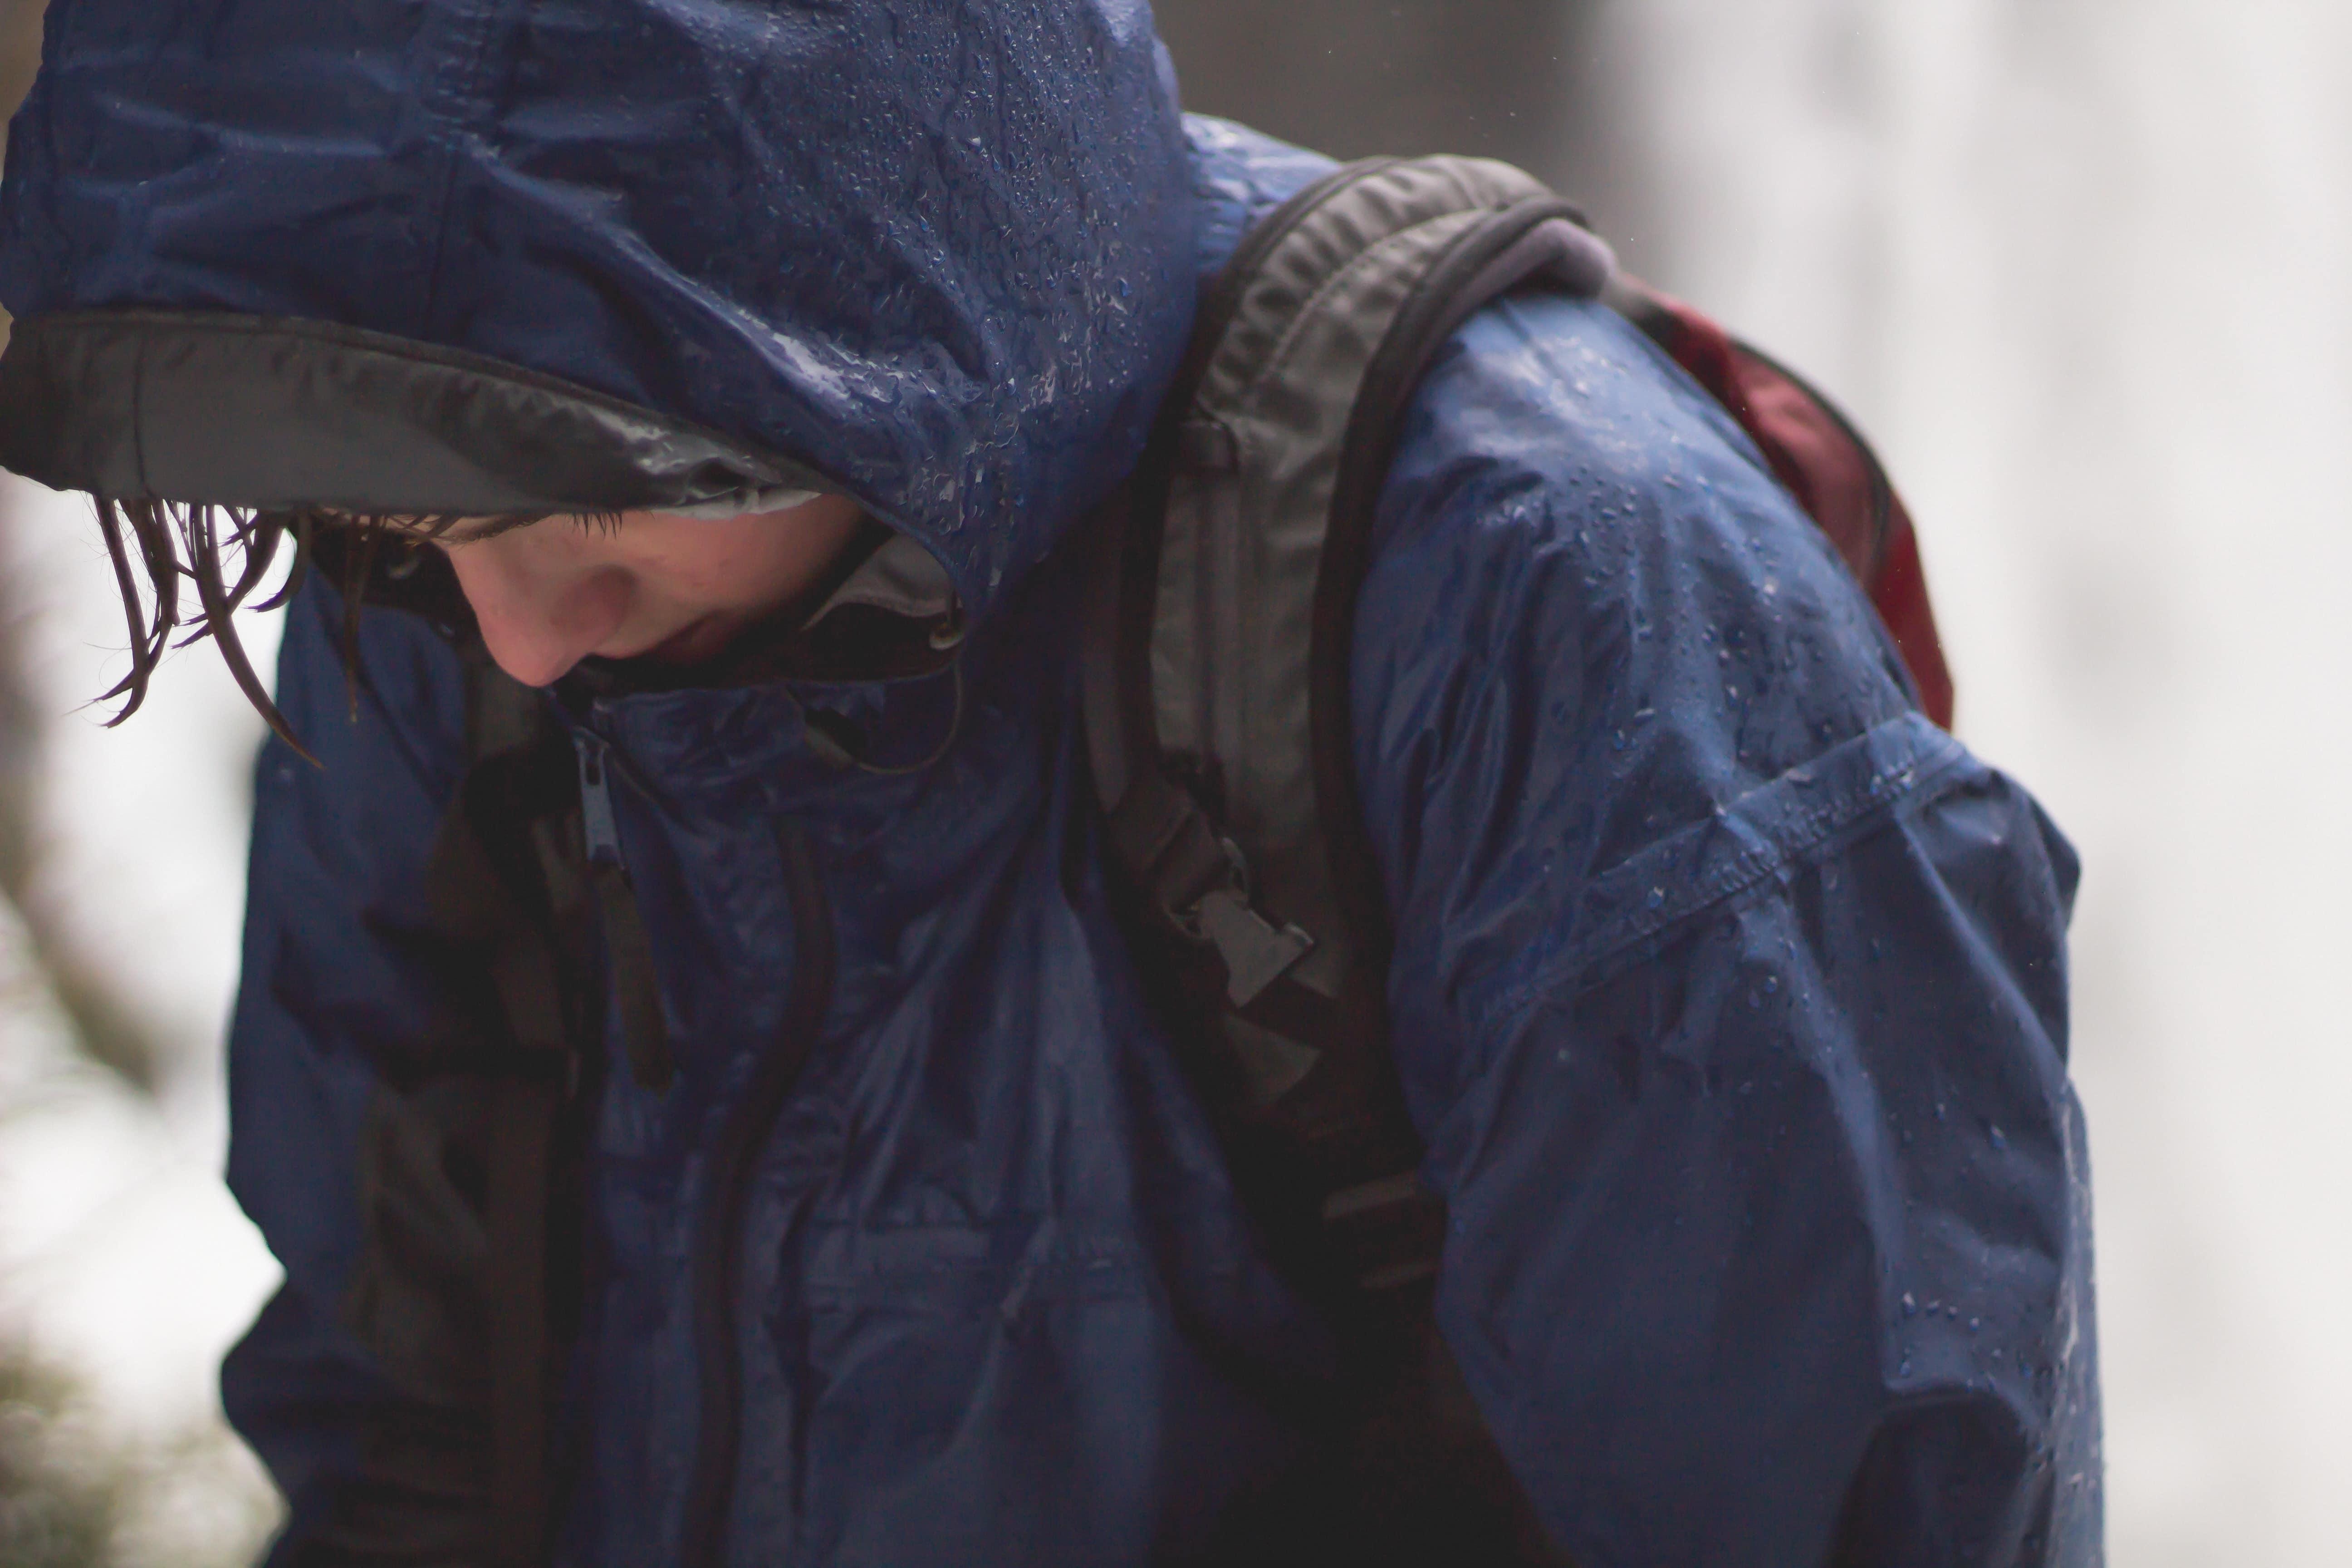 Child in Rain Jacket